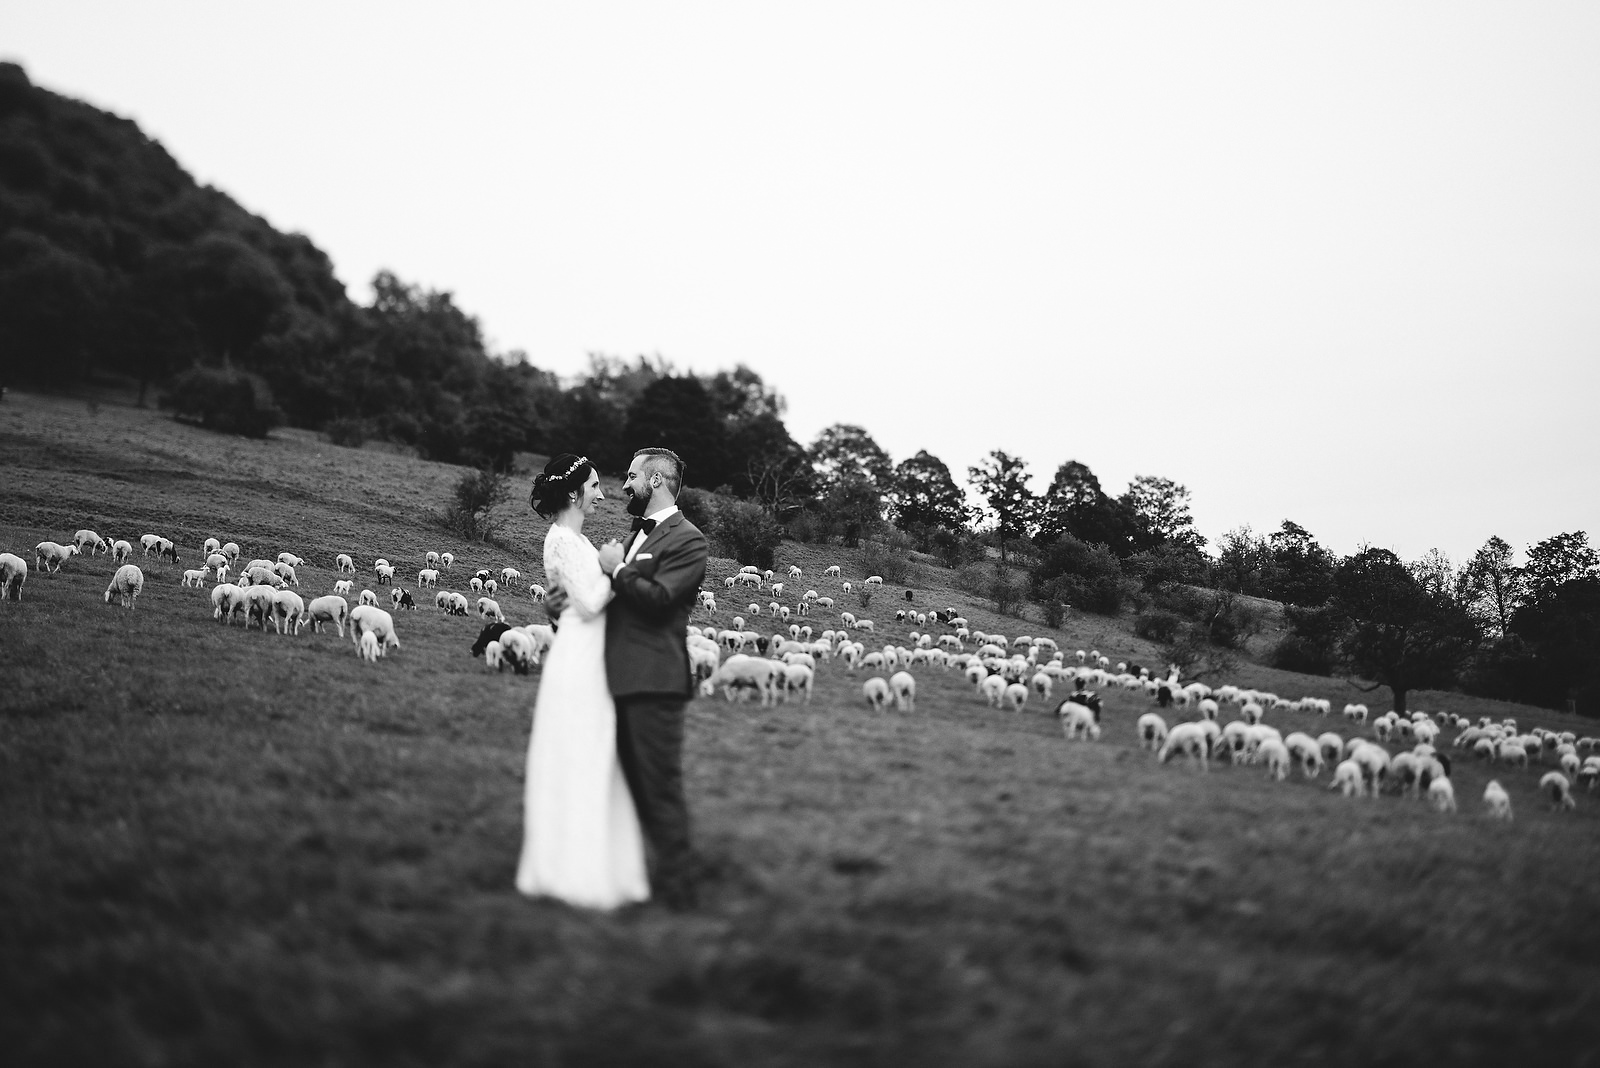 Fotograf Konstanz - Hochzeitsfotograf Reutlingen Achalm Hochzeit EFP 83 - Als Hochzeitsfotograf auf der Achalm, Reutlingen  - 68 -